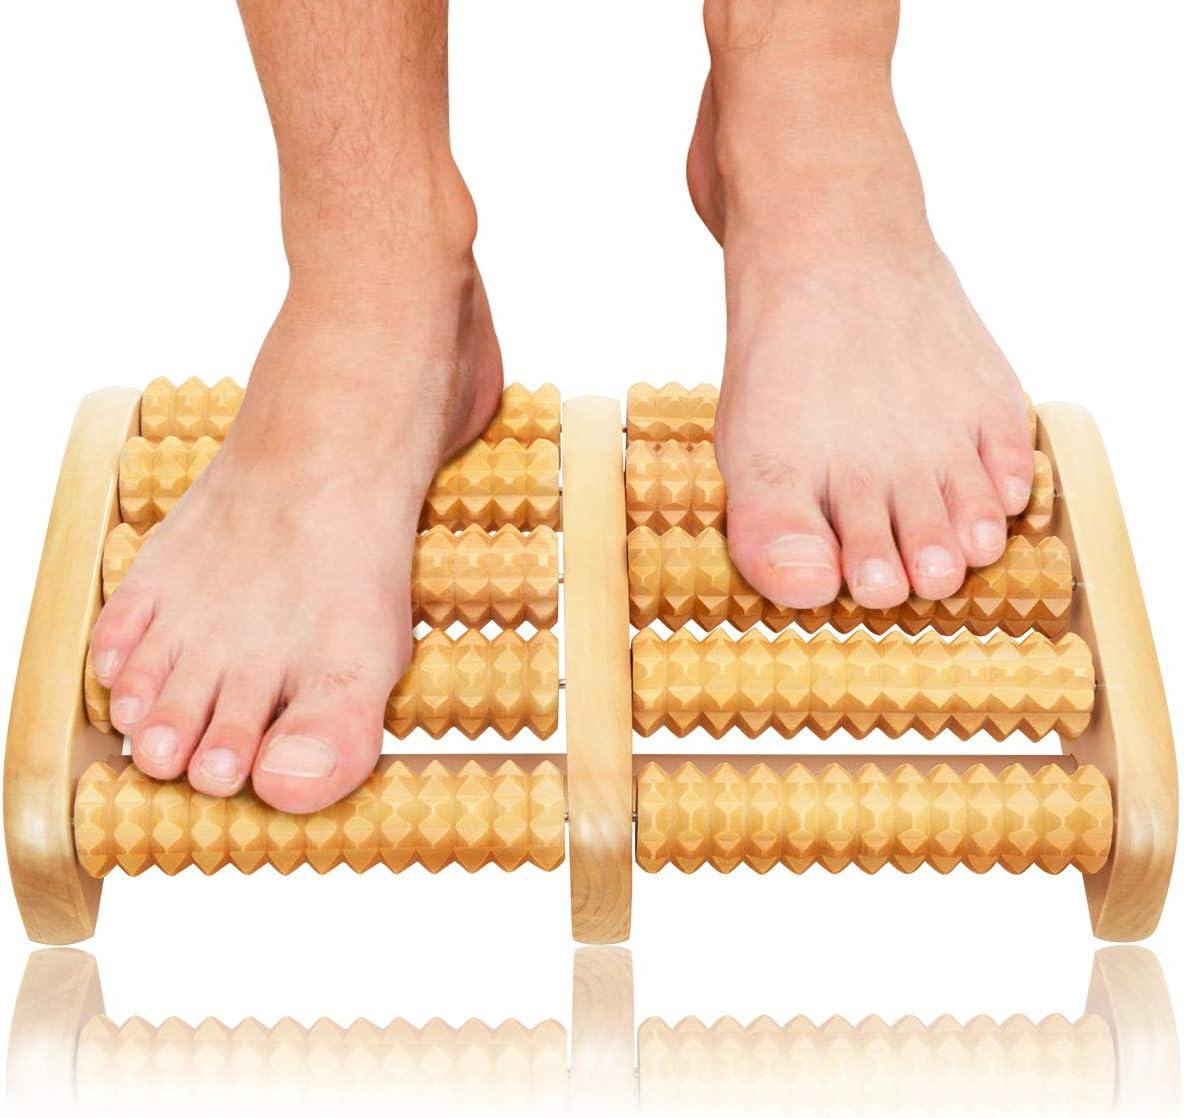 Christmas Gifts Dual Foot Massager Roller - Unique Gifts for Men, Women, Mom, Dad, Teacher - Original Shiatsu Massage for Foot, Leg, Back - Relax & Relieve Foot Pain, Plantar Fasciitis, Stress Relief